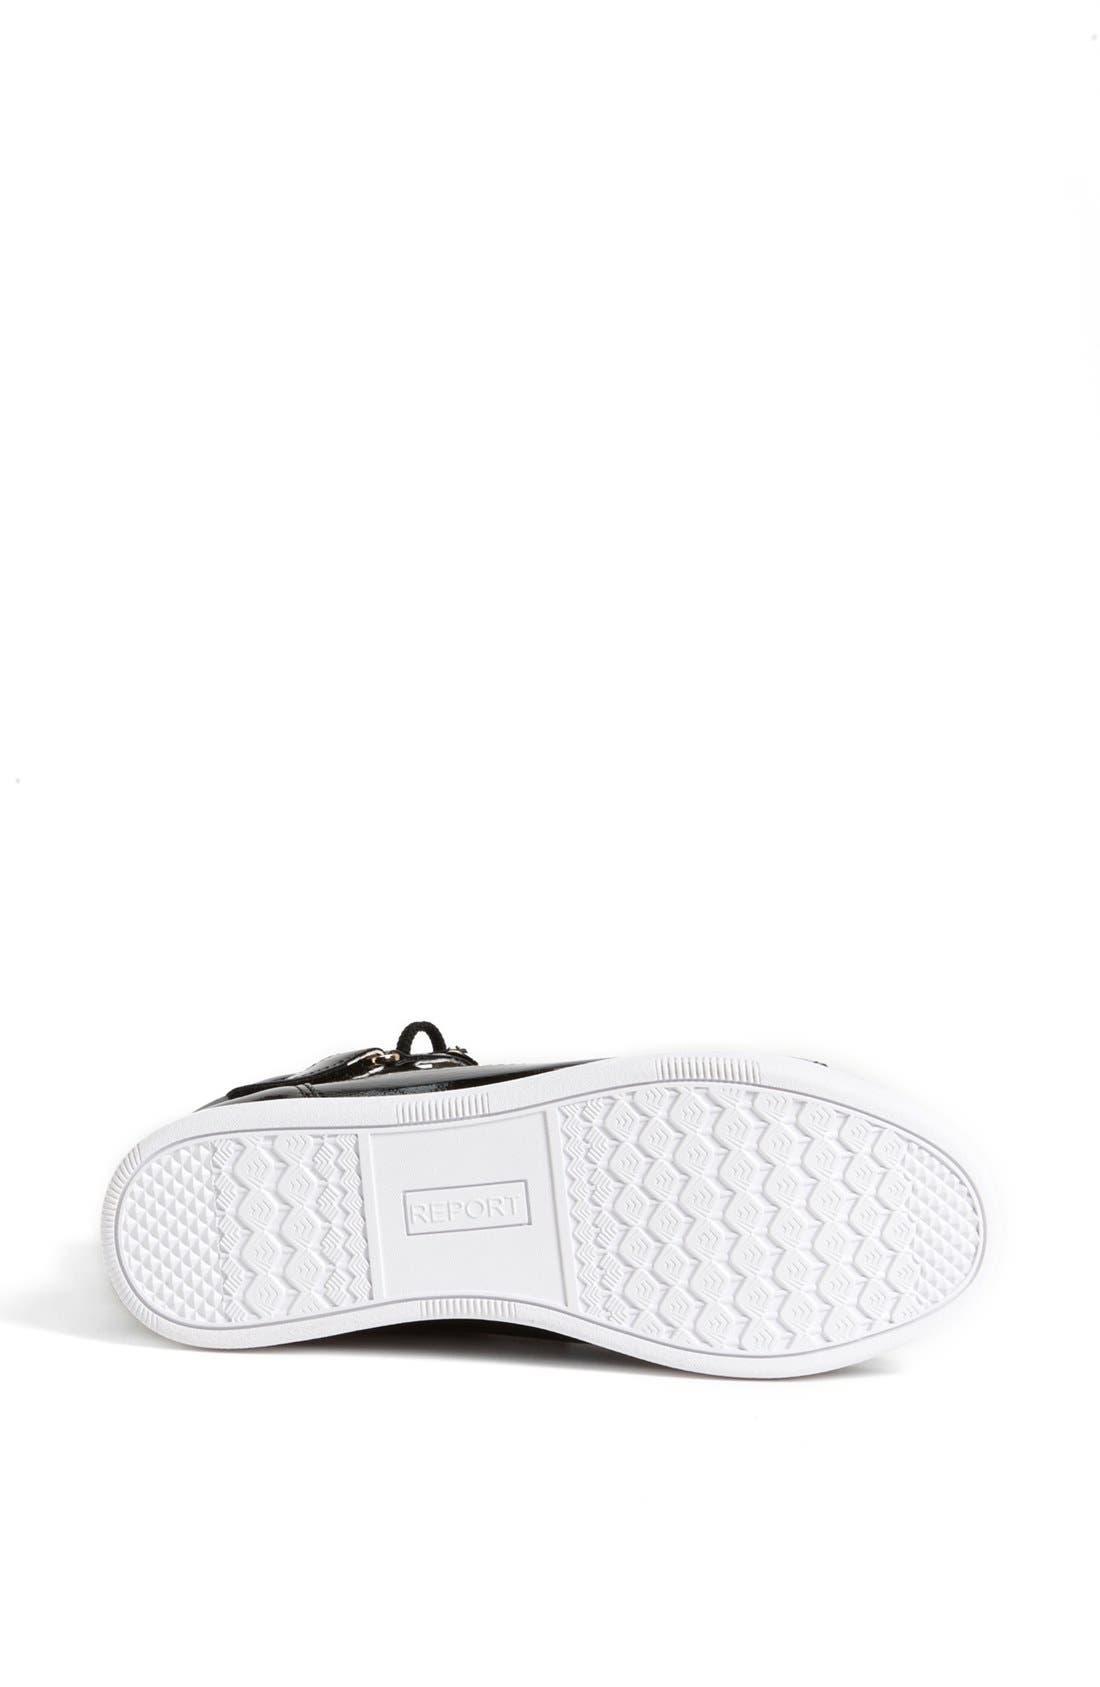 Alternate Image 4  - REPORT Signature 'Lavita' Sneaker